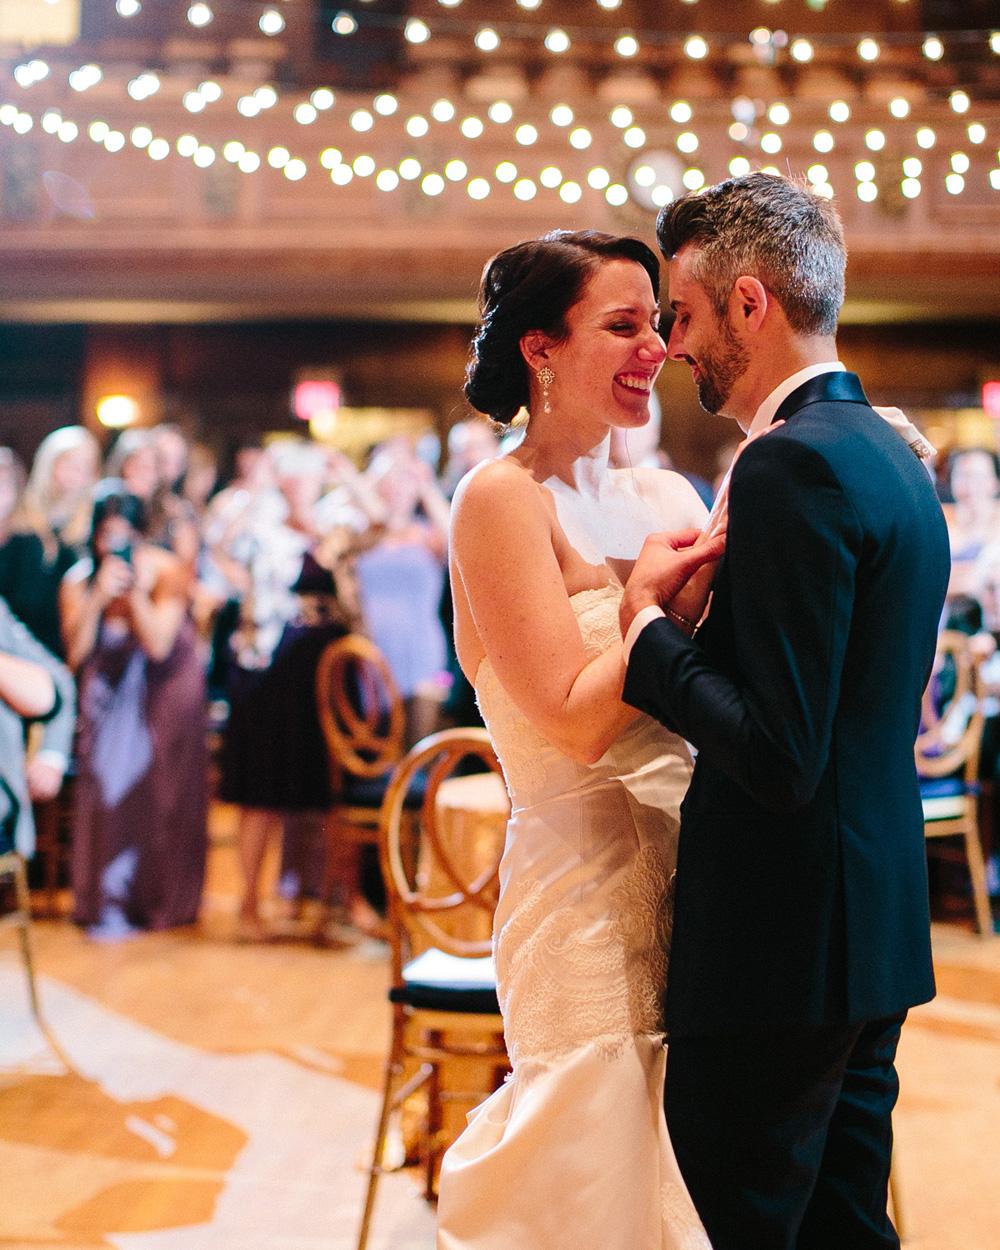 054-arlington-town-hall-wedding-reception.jpg